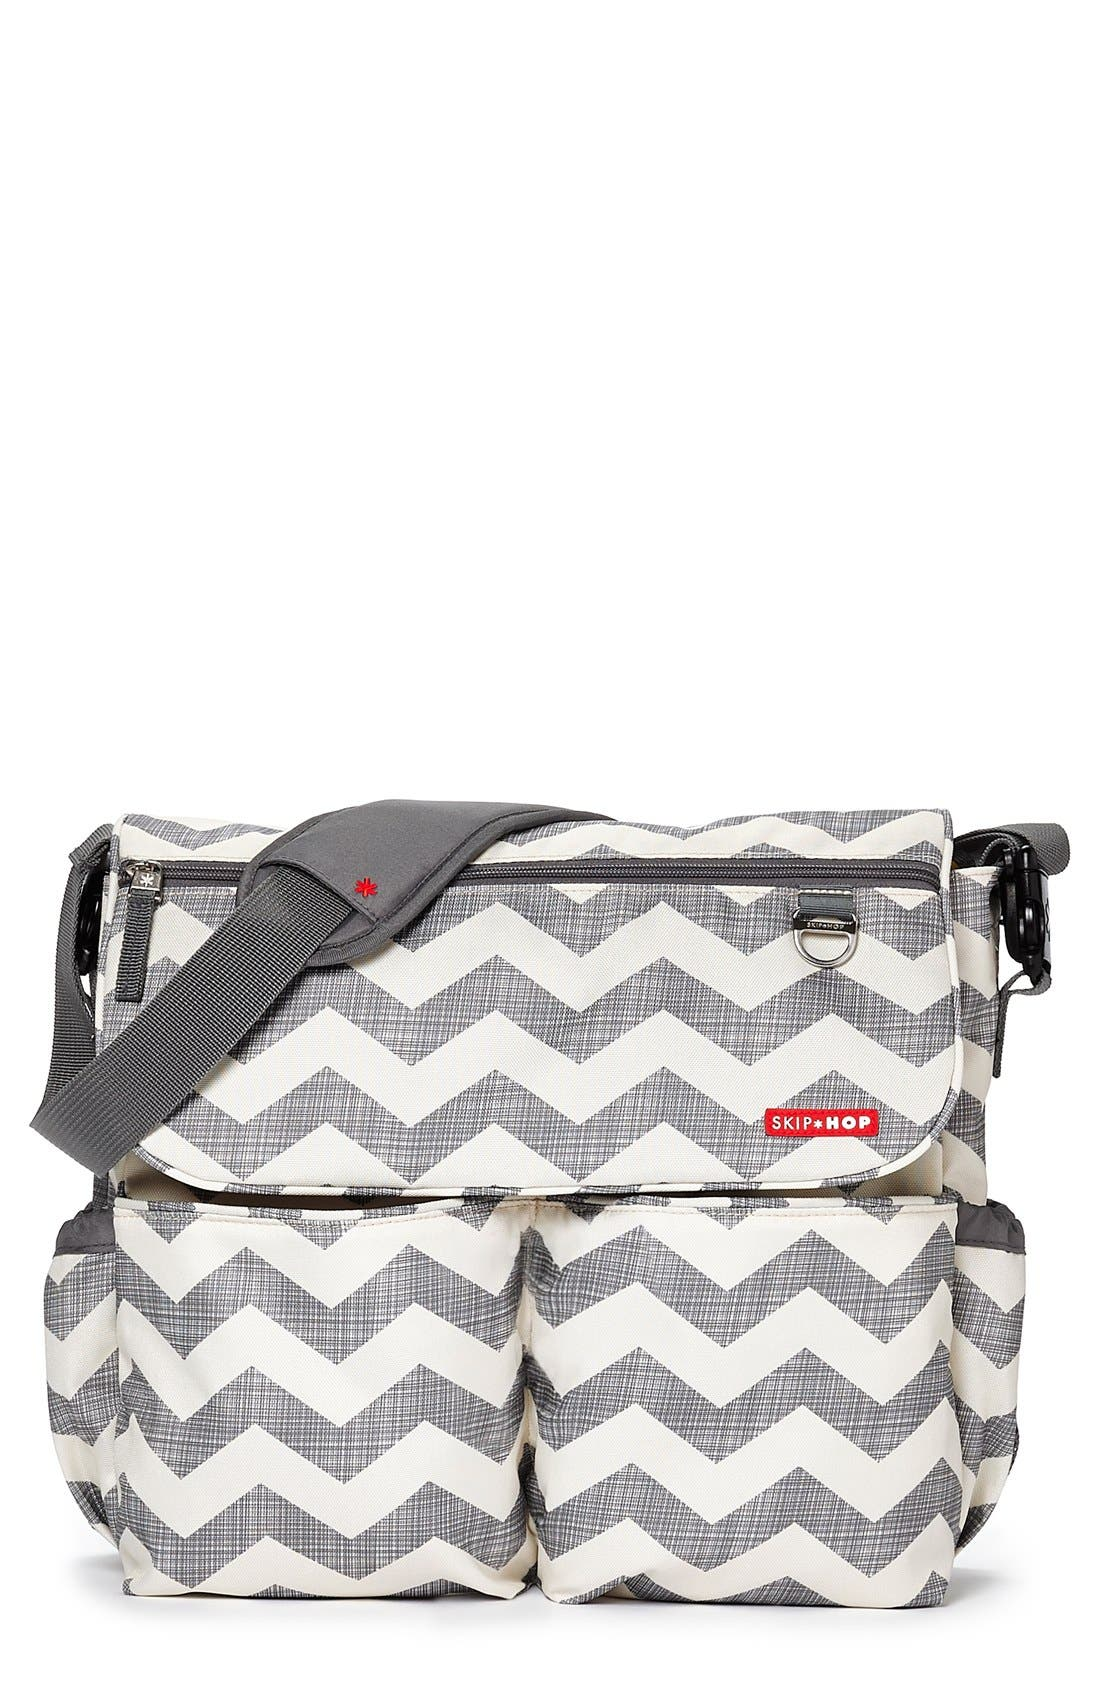 'Dash Signature' Messenger Diaper Bag,                             Main thumbnail 1, color,                             Grey